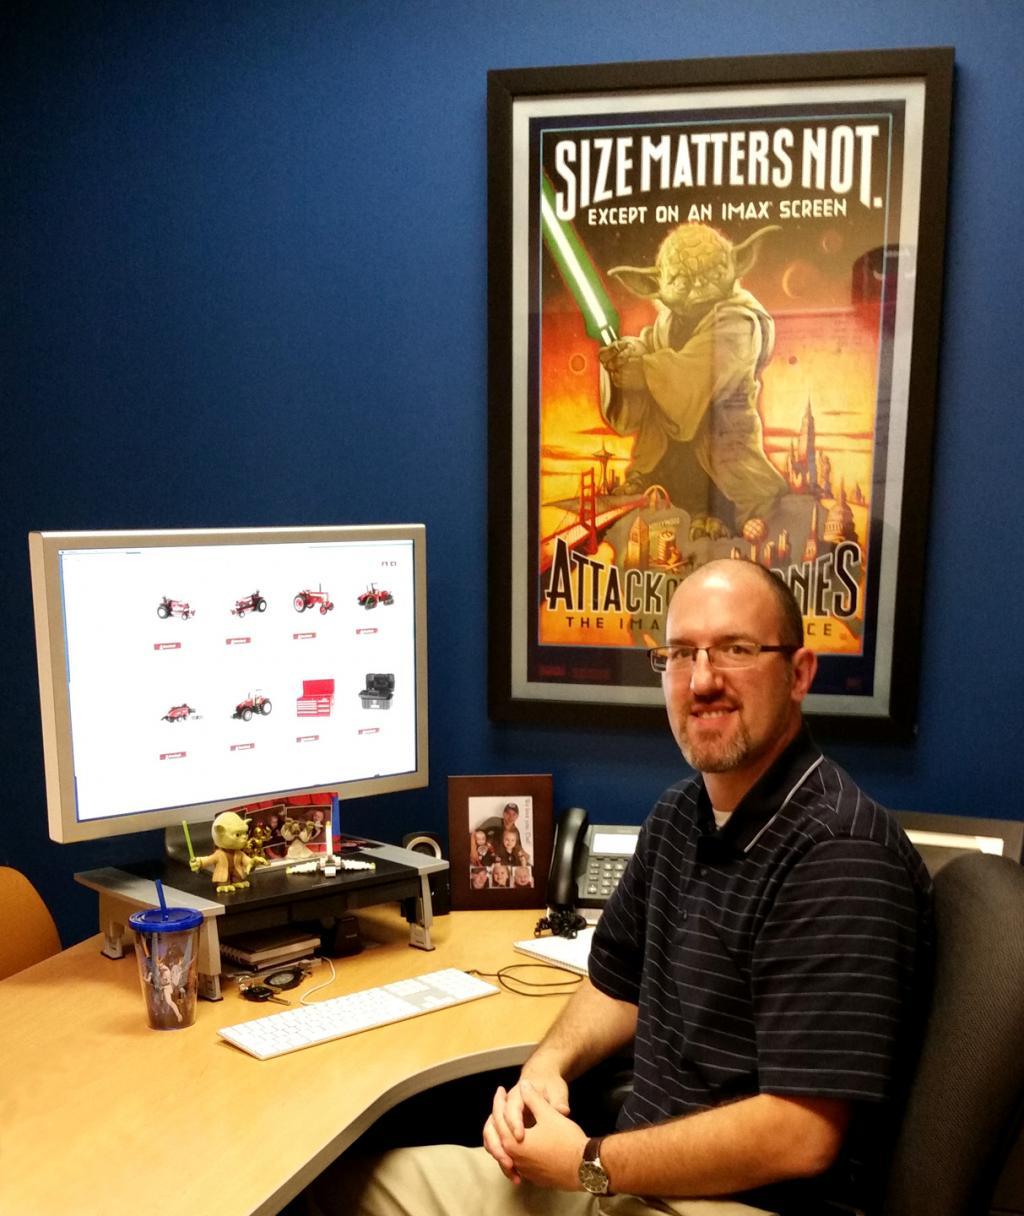 Tim Goodman of Equity Creative